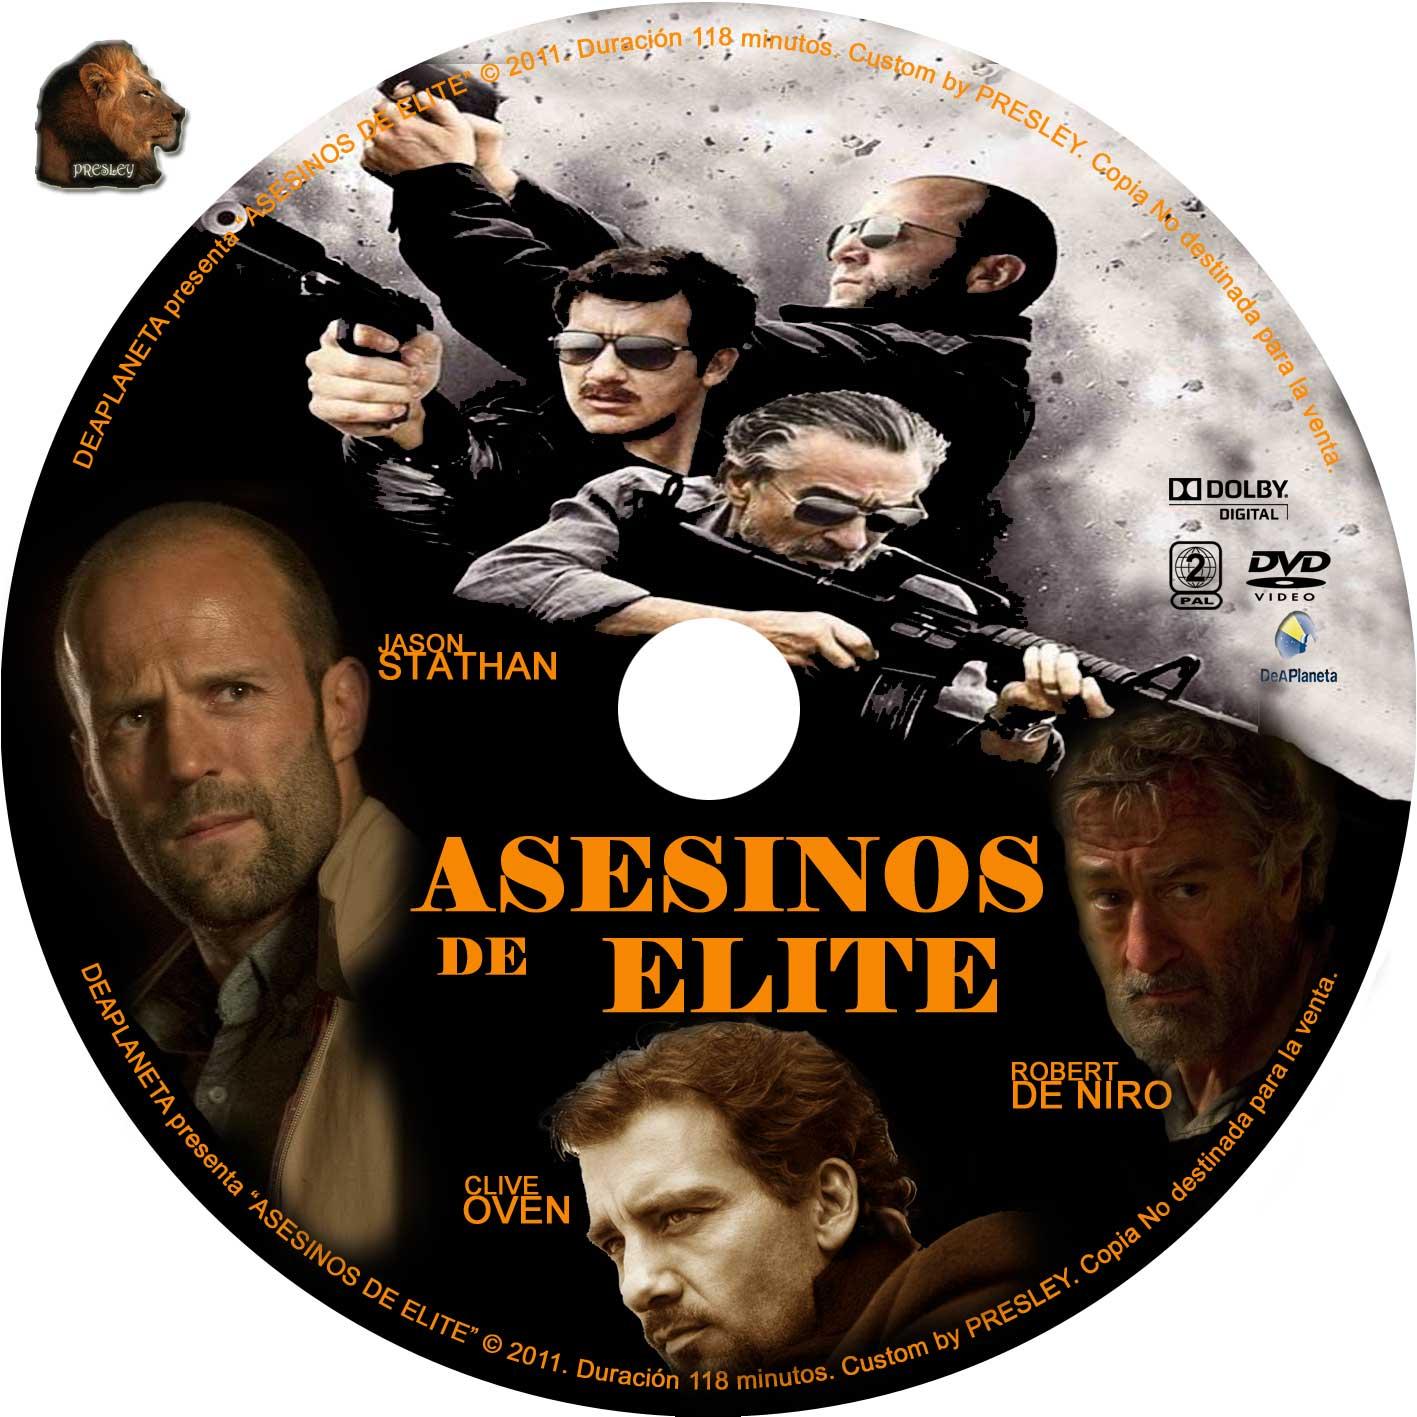 http://2.bp.blogspot.com/-znxKoDpRIaU/Tohxso-pBtI/AAAAAAAAA30/yz4gHGG4Z0g/s1600/asesinos-de-elite-dvdv1.jpg